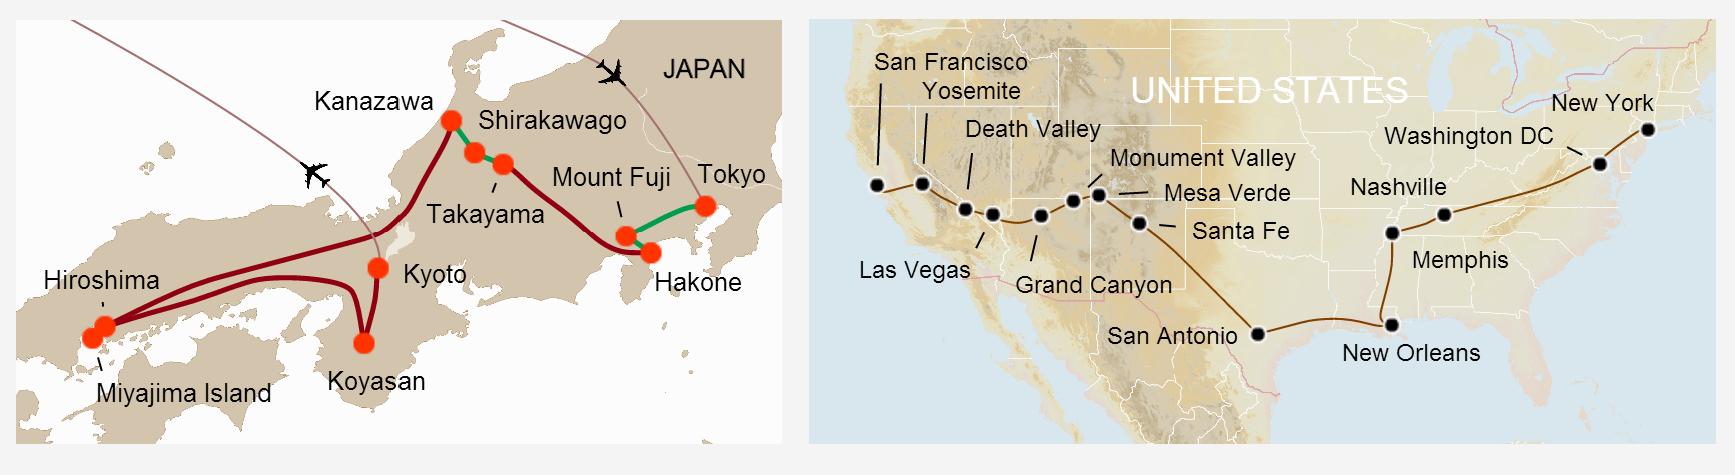 Travel Itinerary Maps IgemoeIgemoe